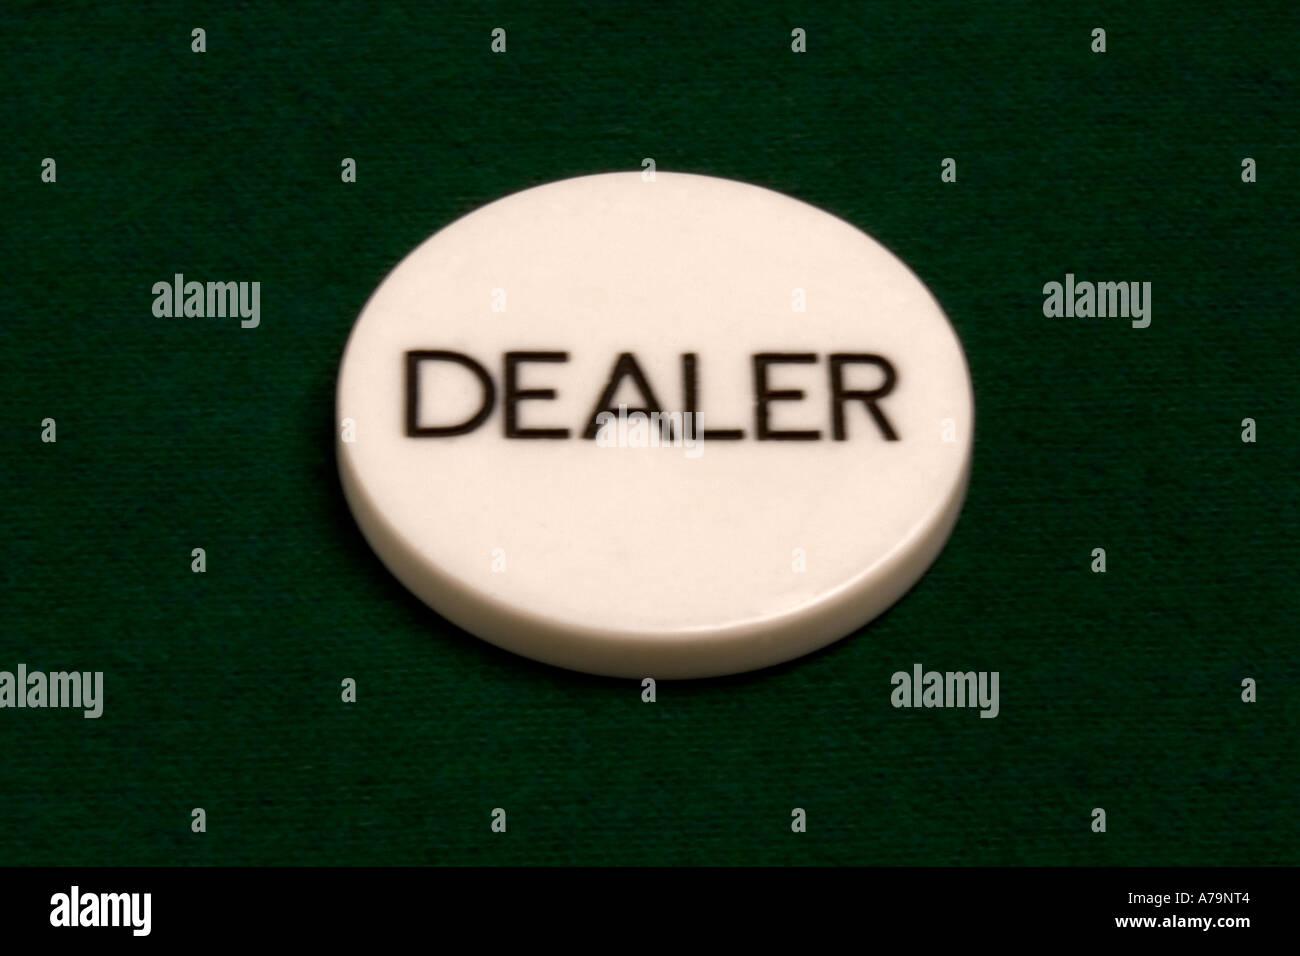 Dealer button - Stock Image